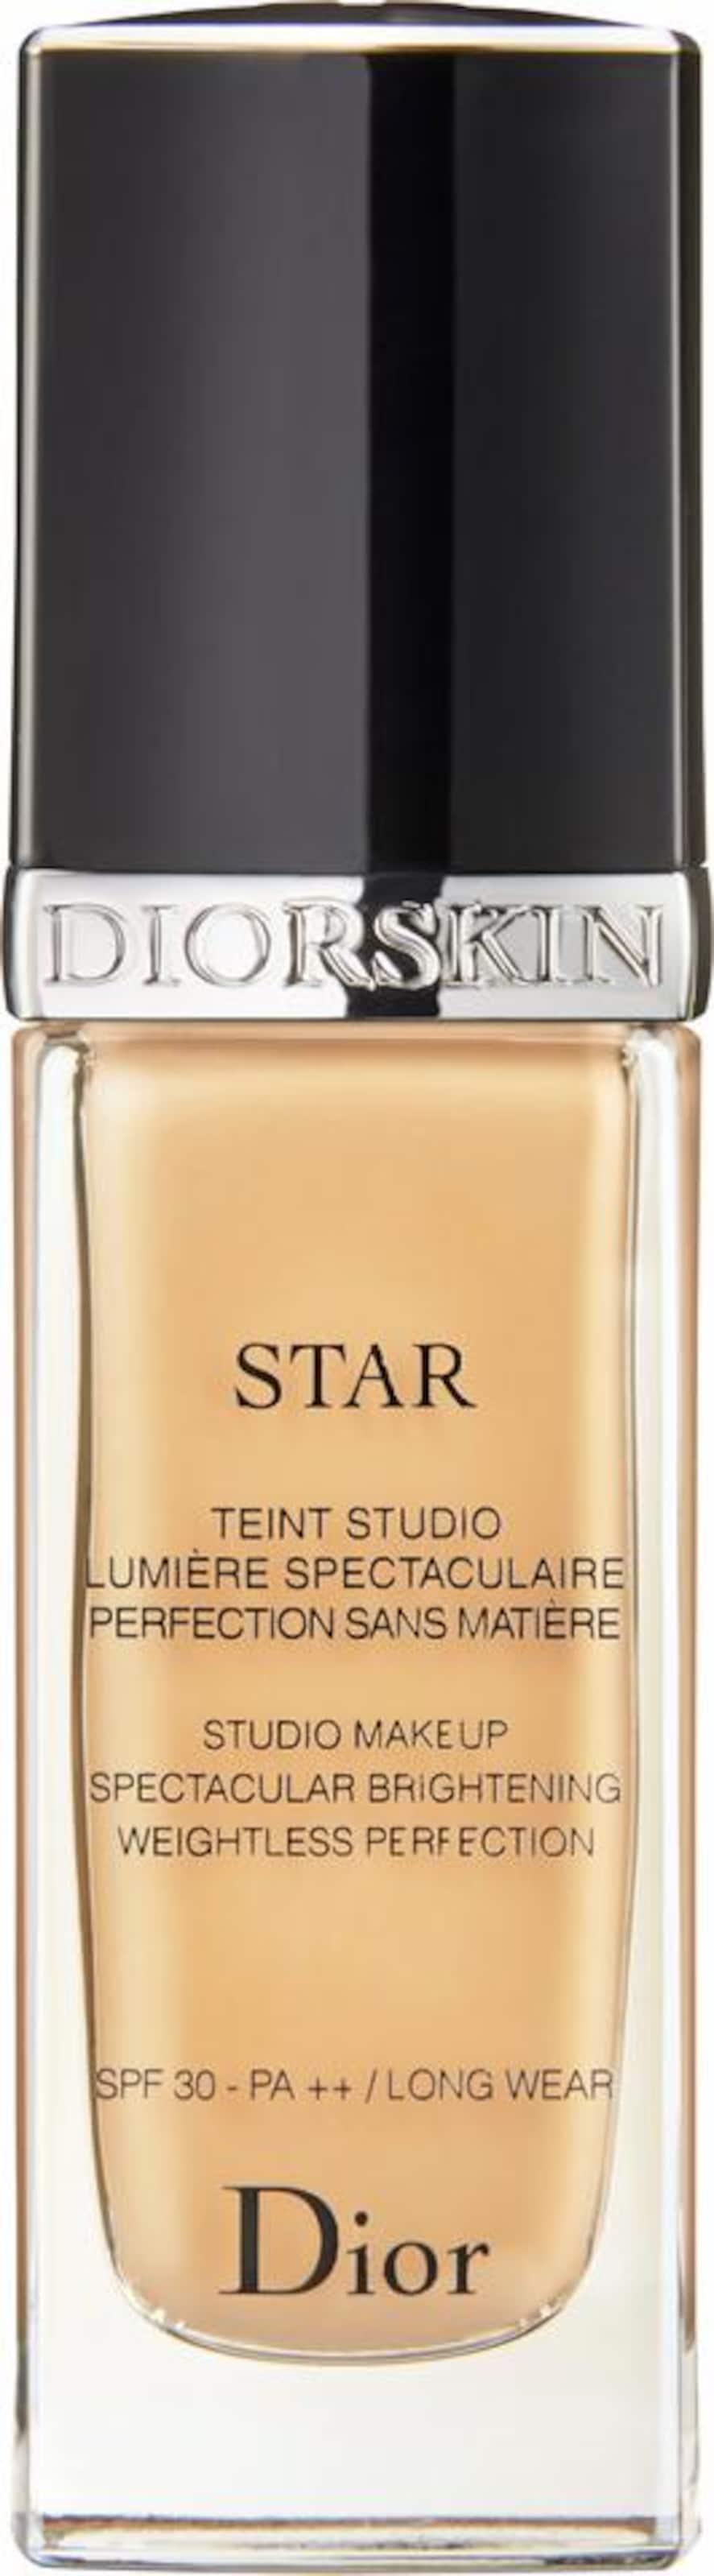 Dior 'Diorskin Star' Foundation Rabatt Großer Rabatt vYYXjVQEZw